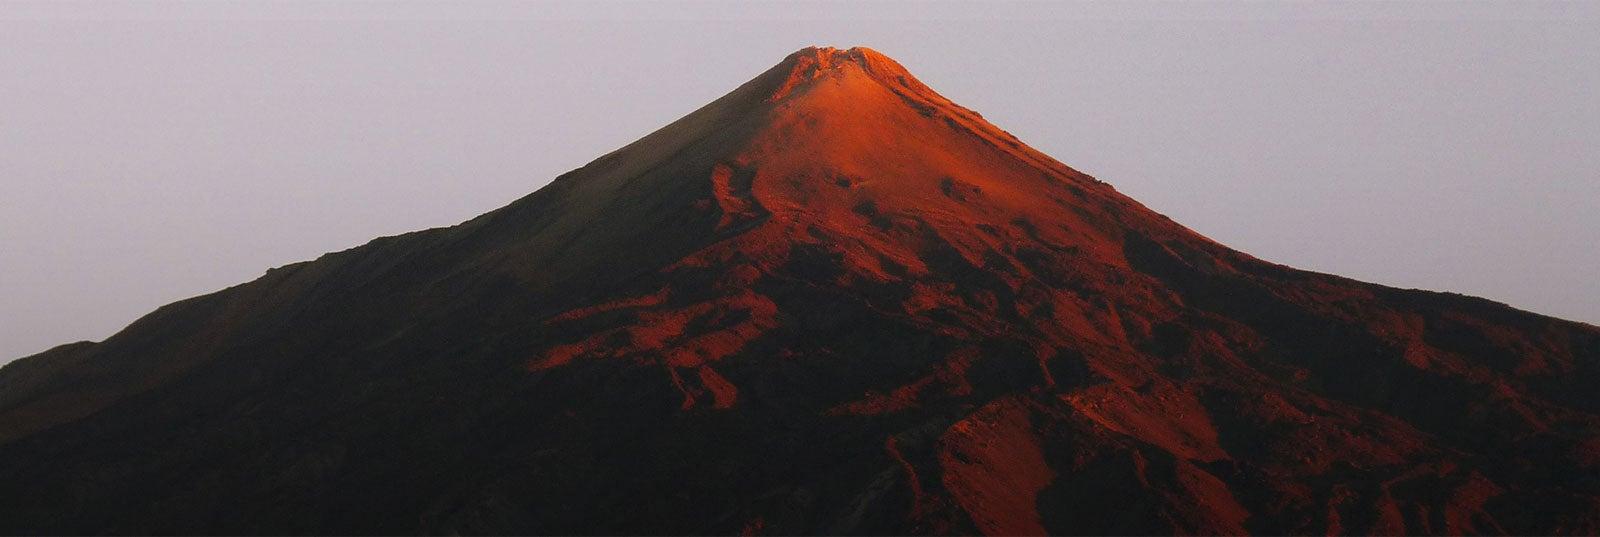 Guía turística de Tenerife